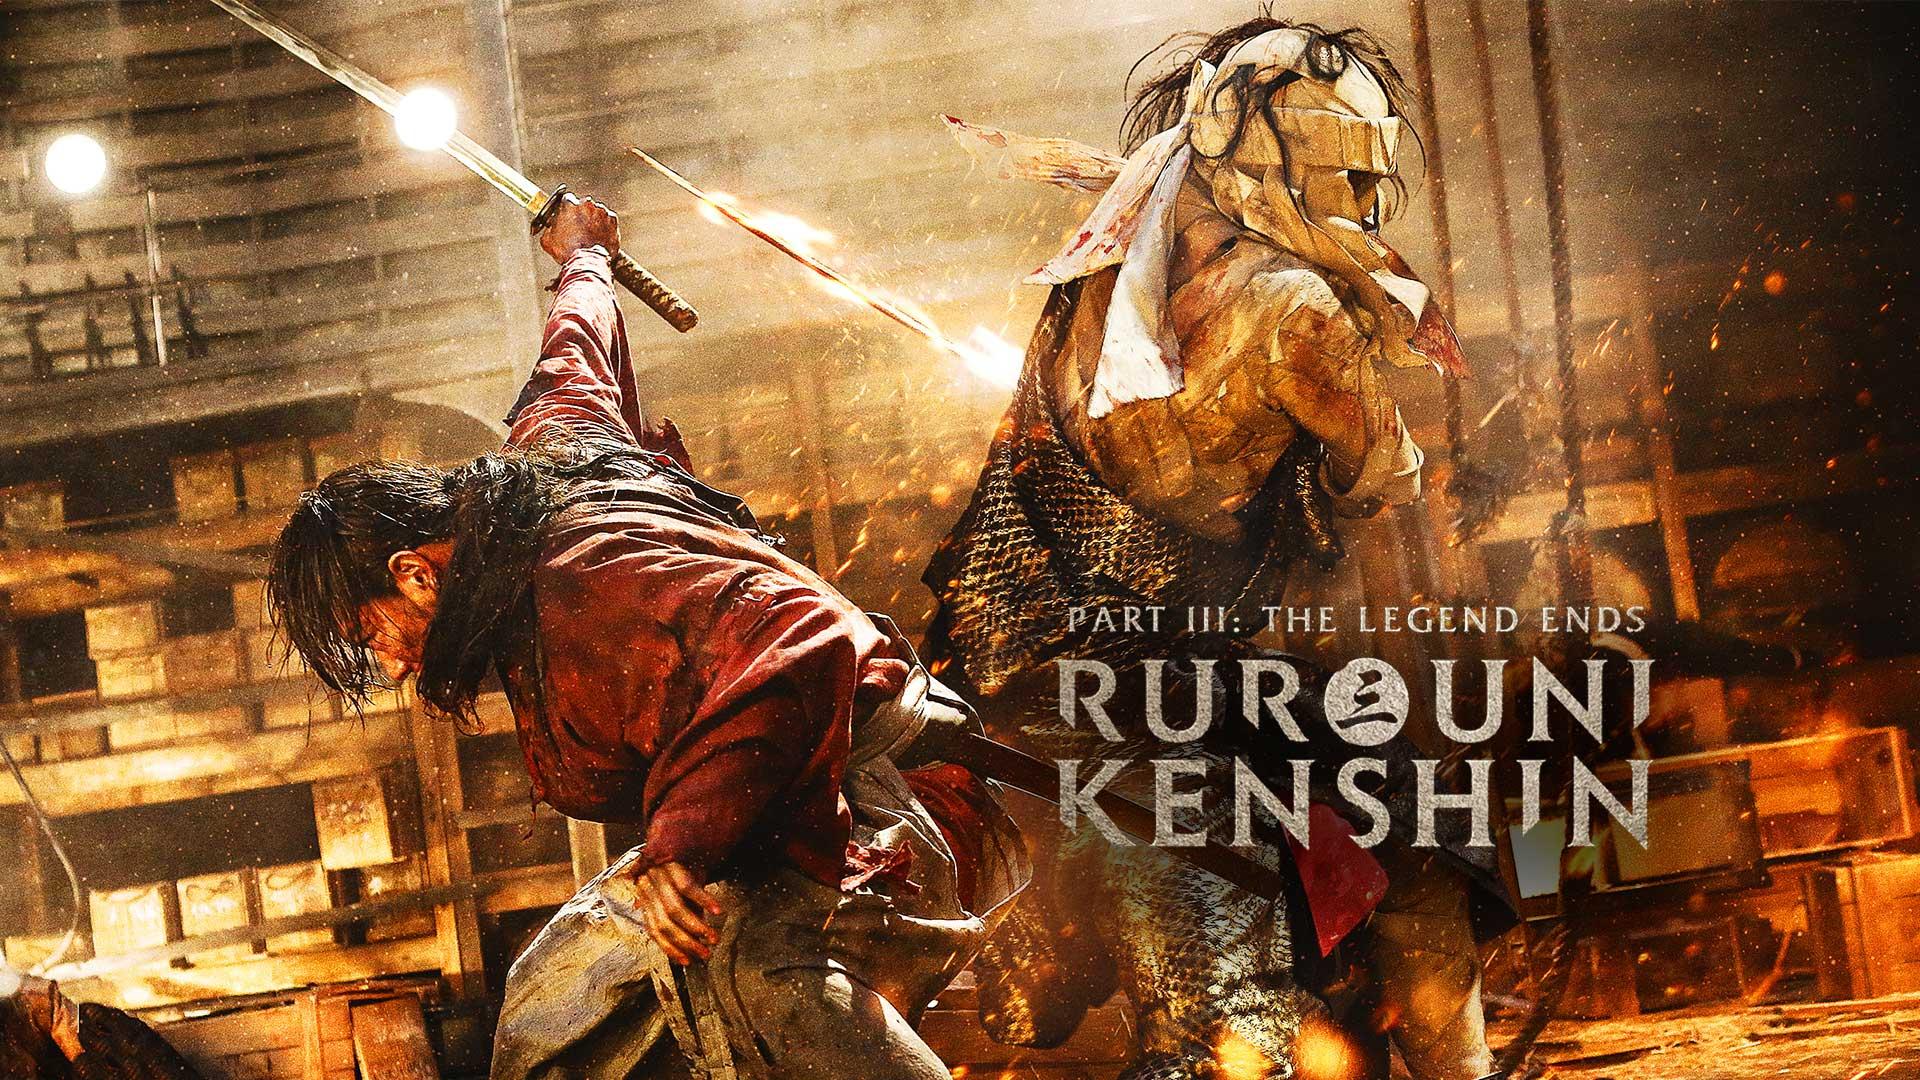 Rurouni Kenshin - Part III: The Legend Ends